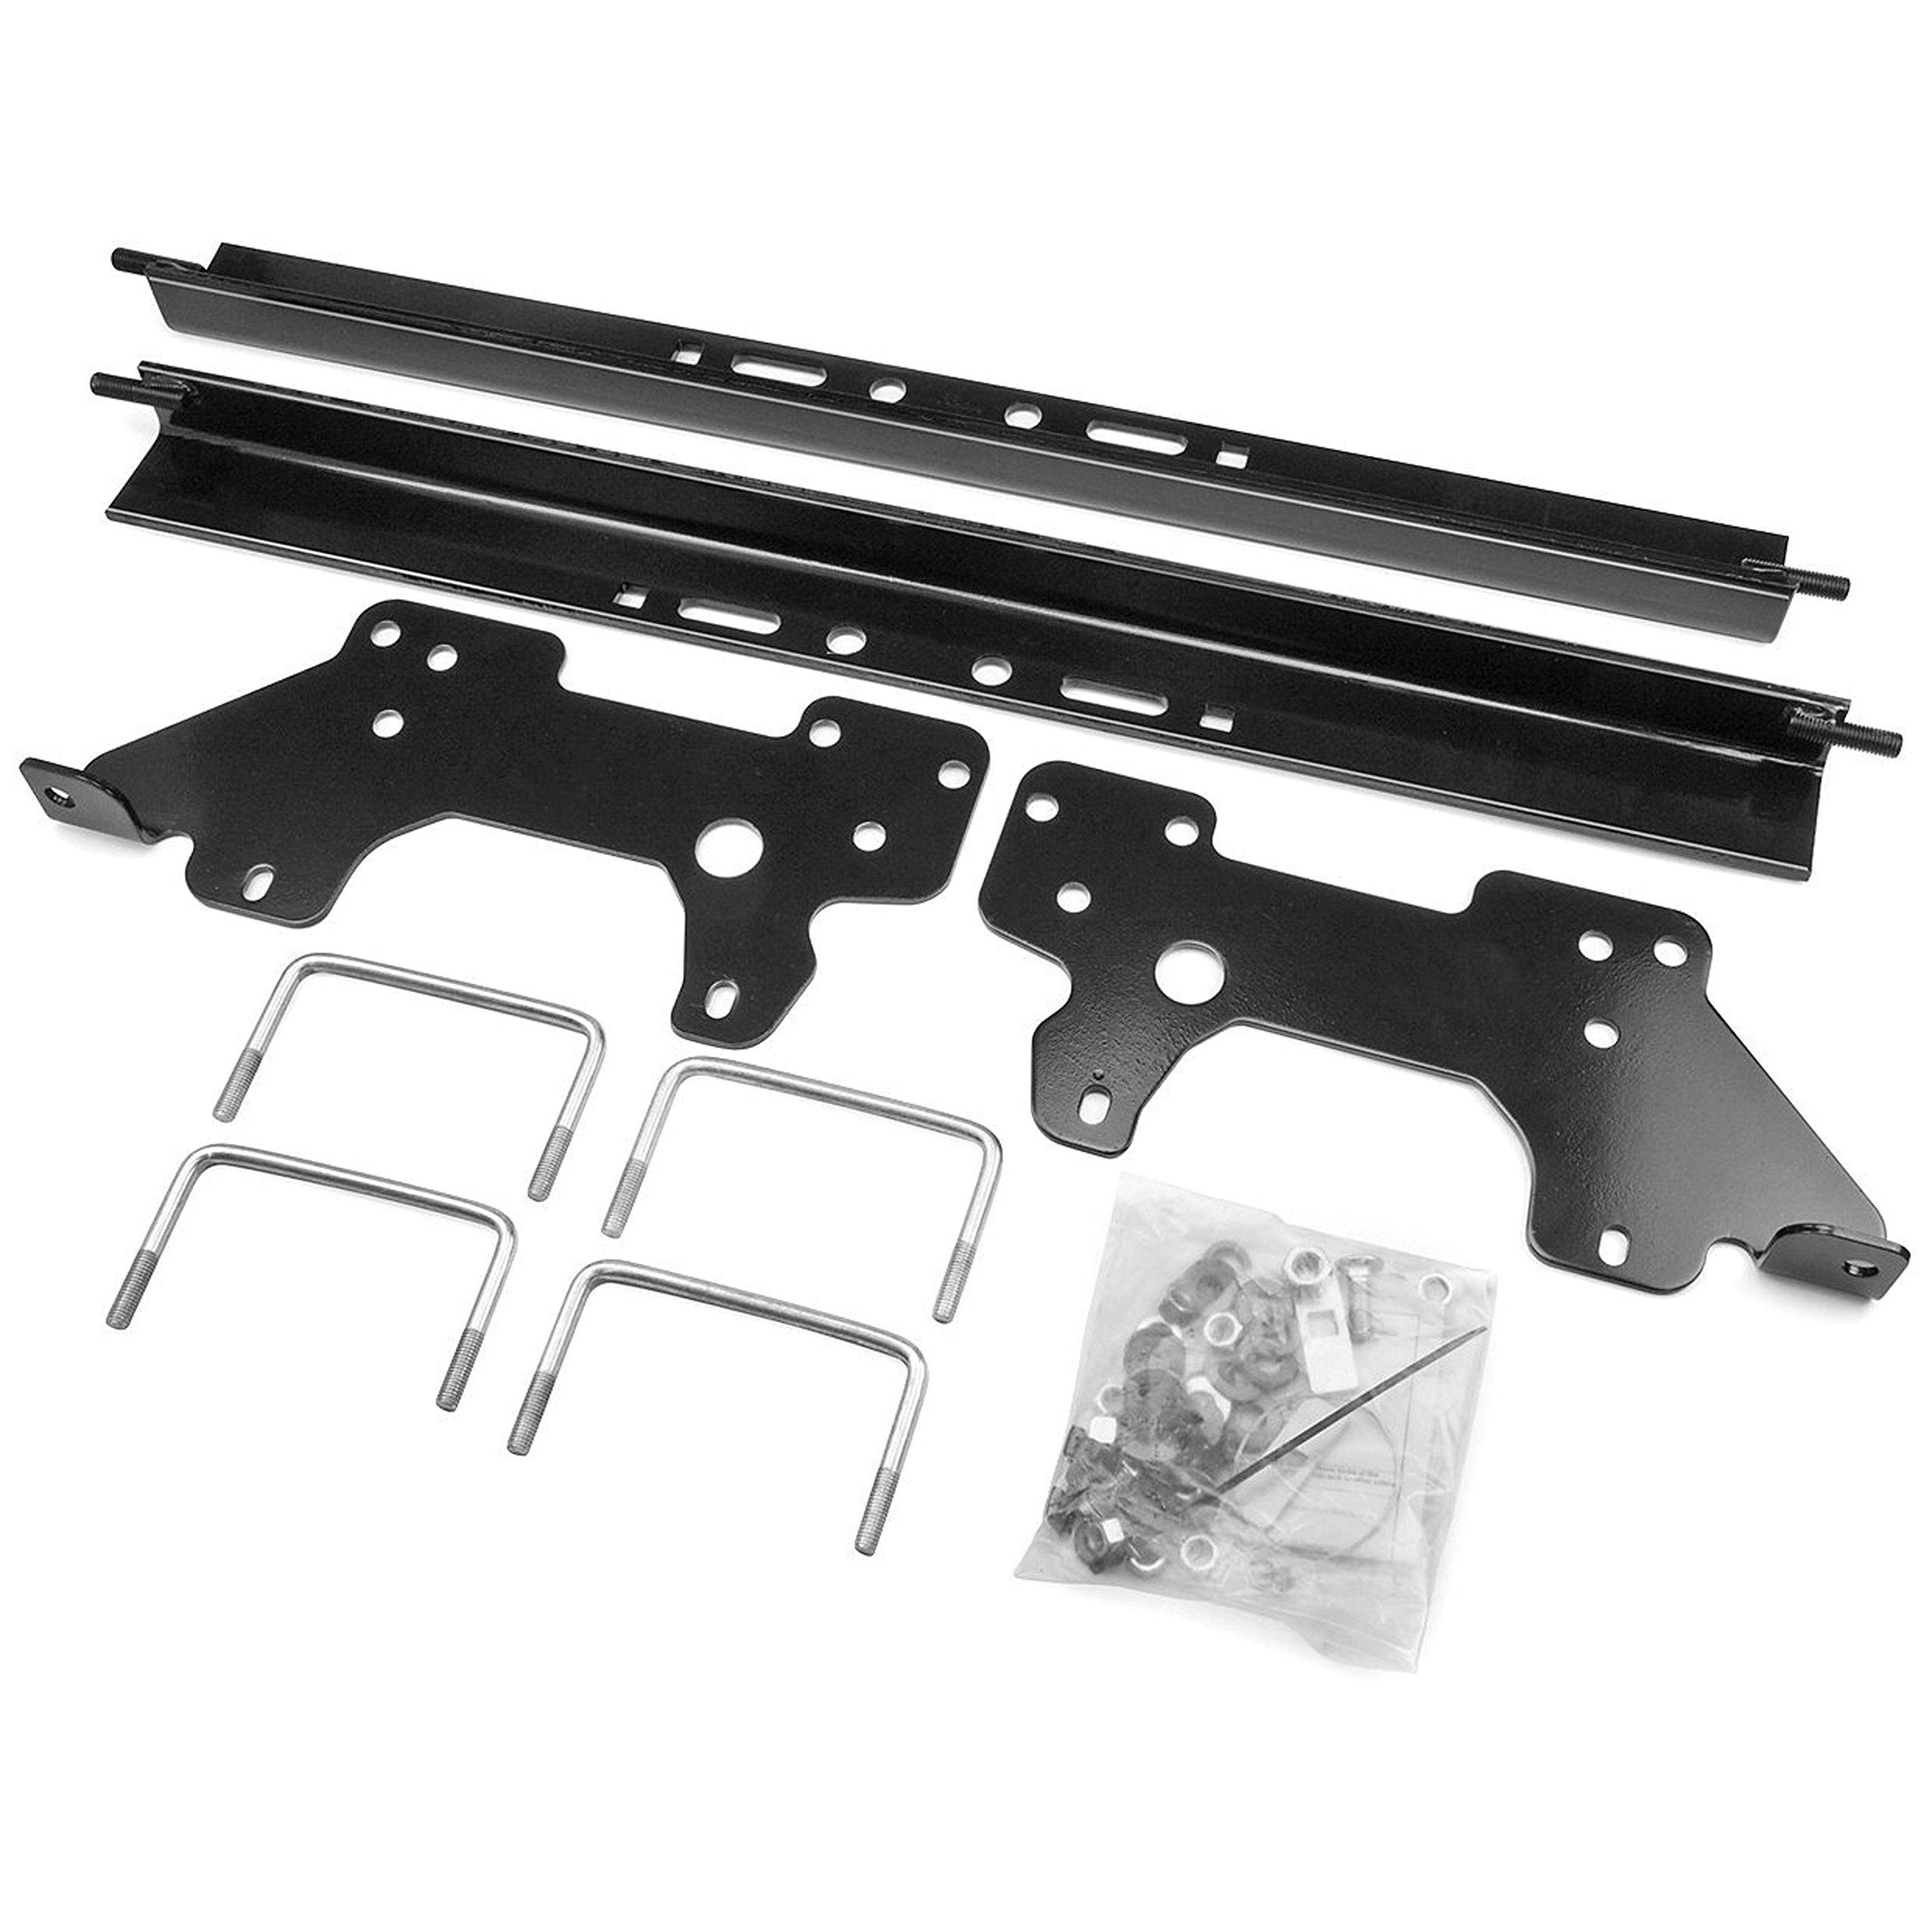 Draw-Tite 4435 Gooseneck Rail Kit for Dodge/Ram by Draw-Tite